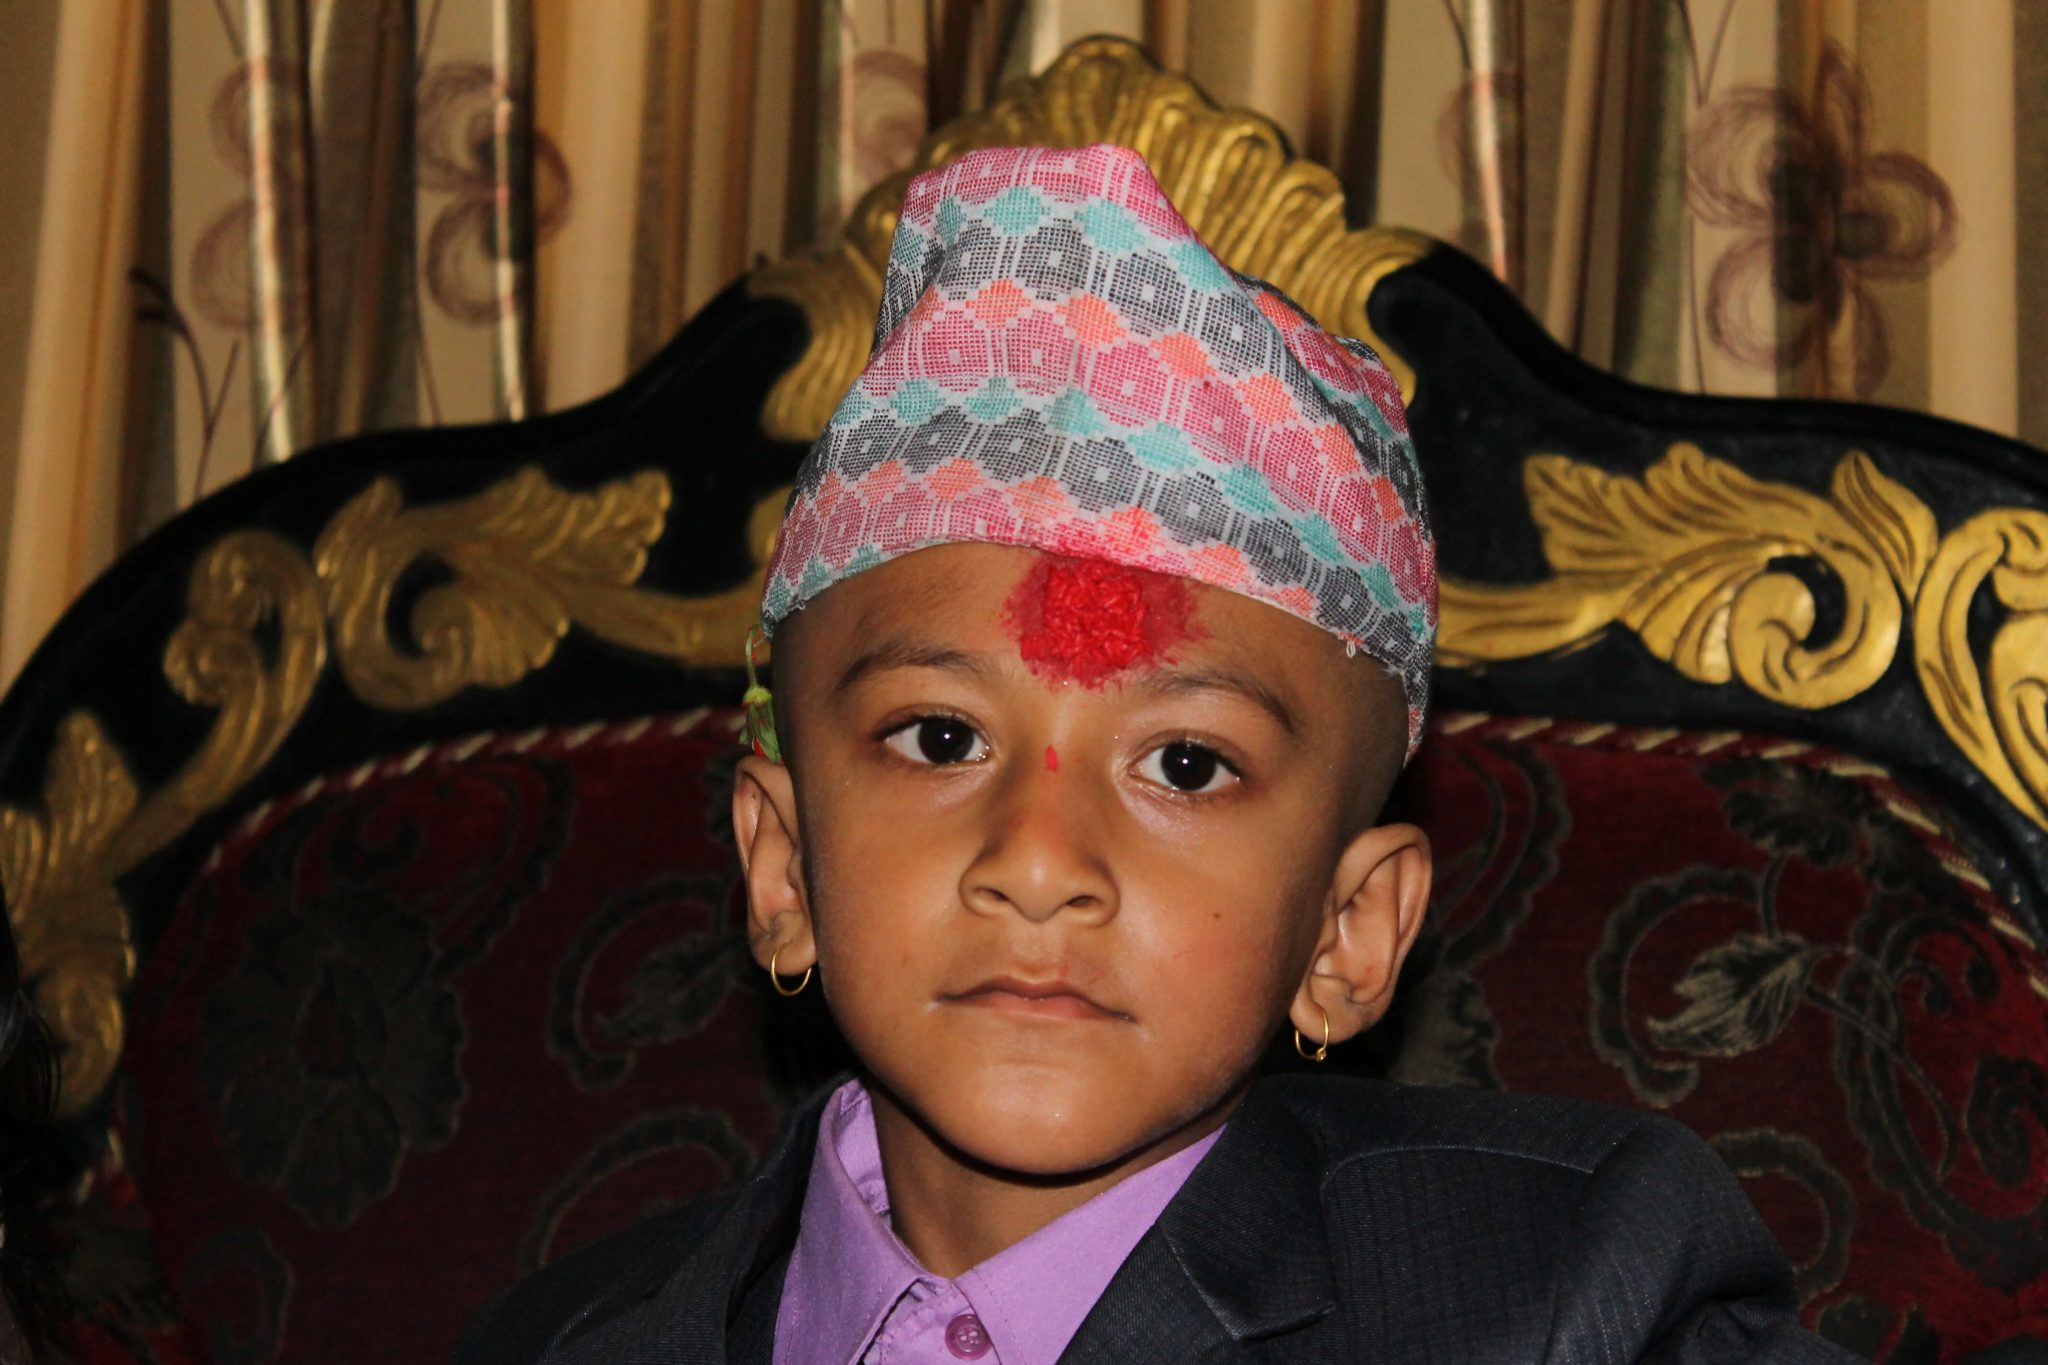 Dhaka Topi | Nepali Hat